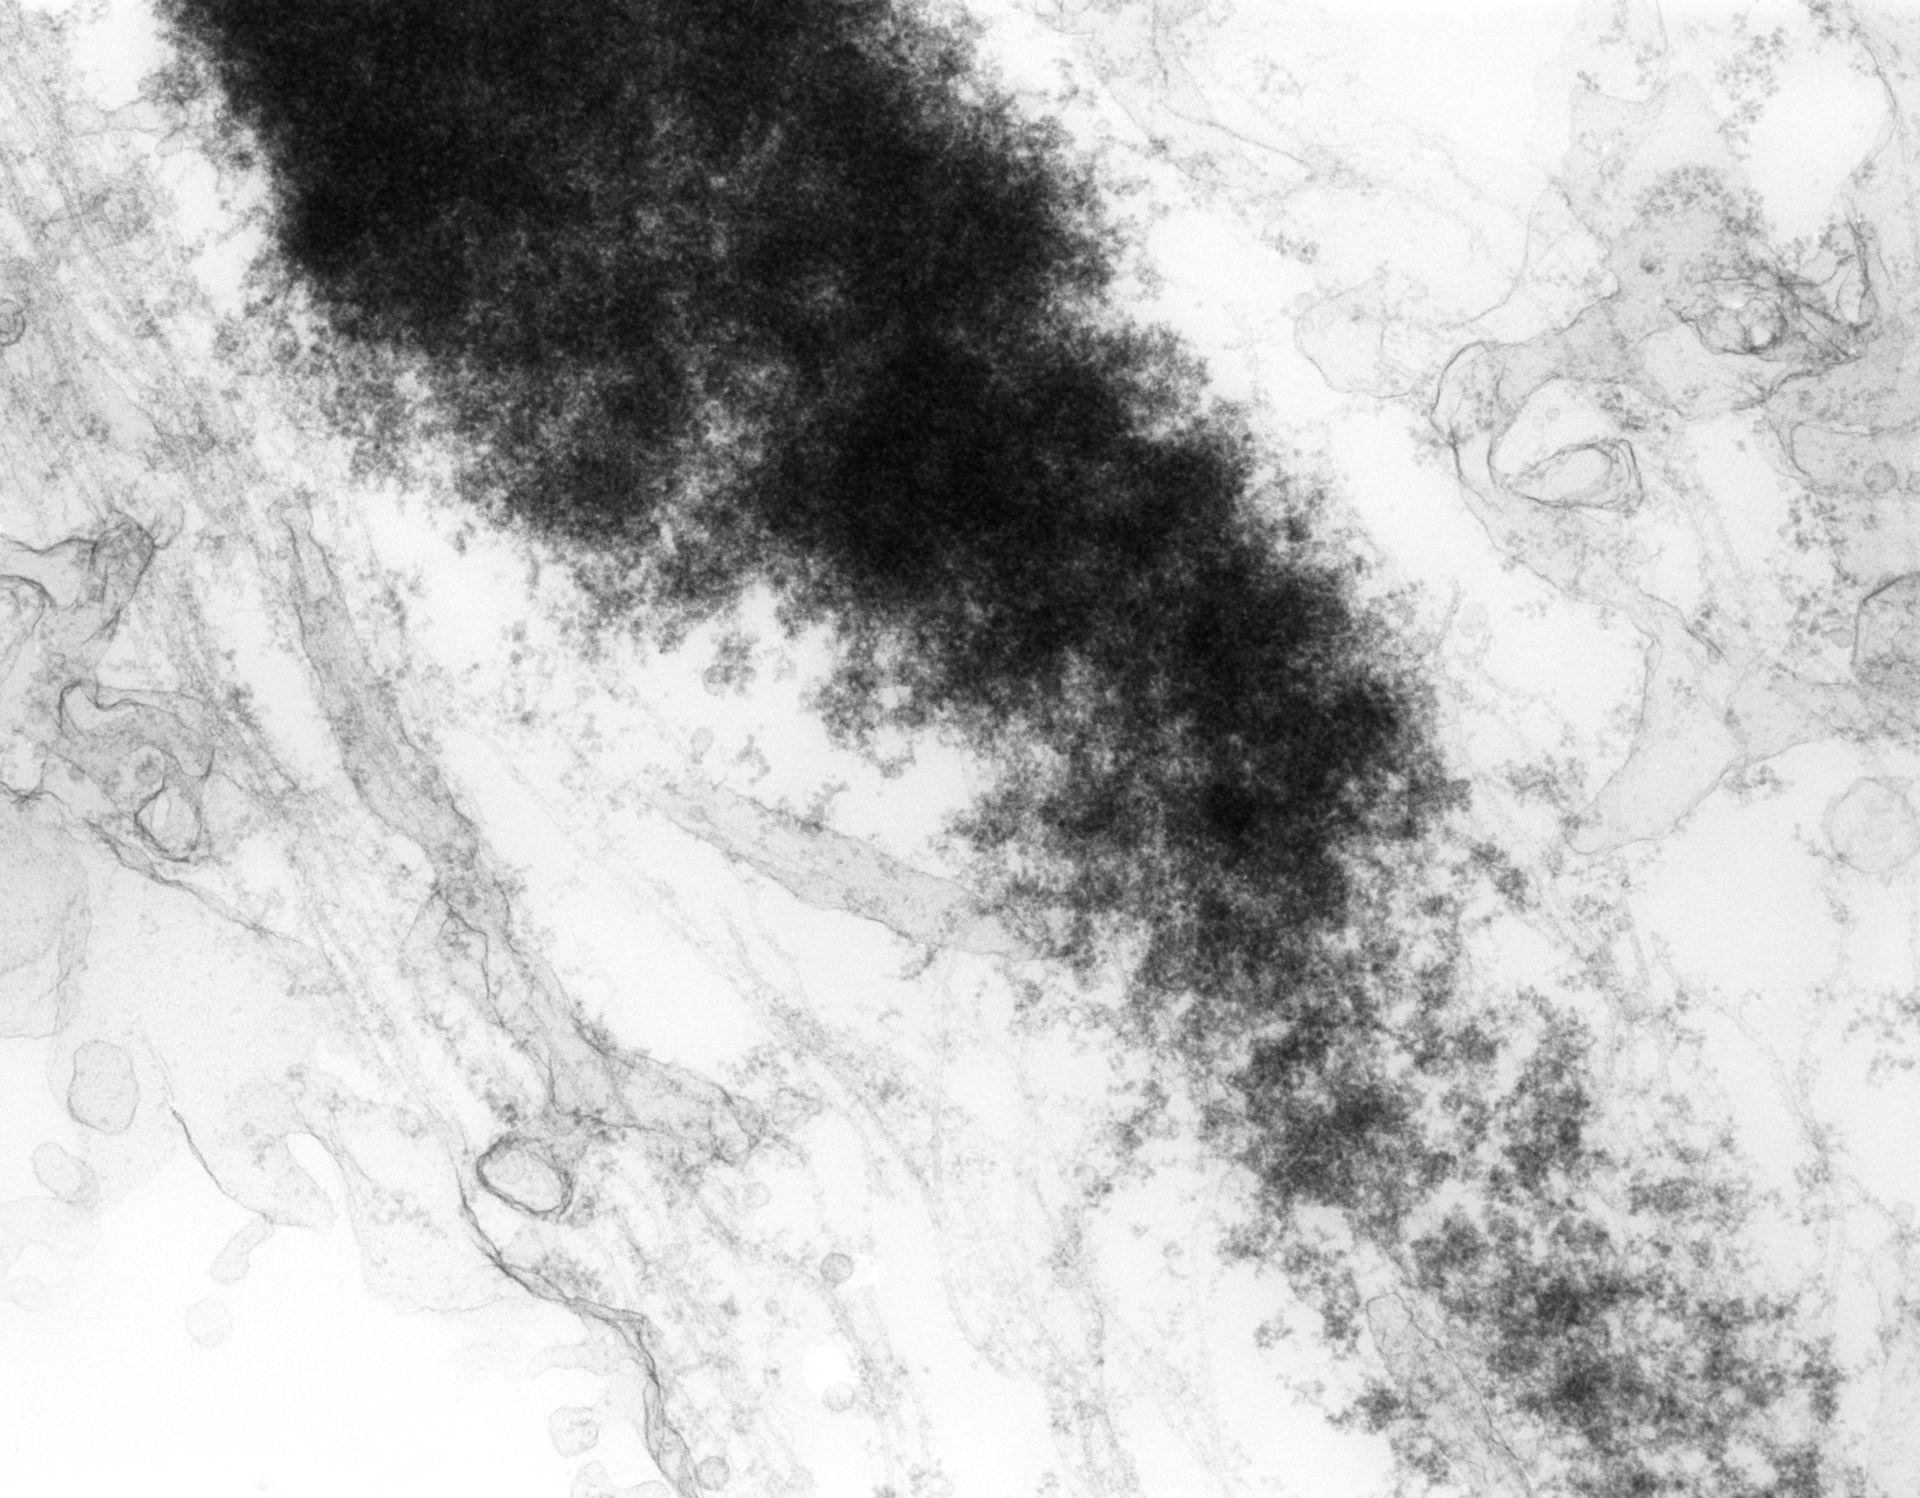 Haemanthus katharinae (Nuclear chromosome) - CIL:11852